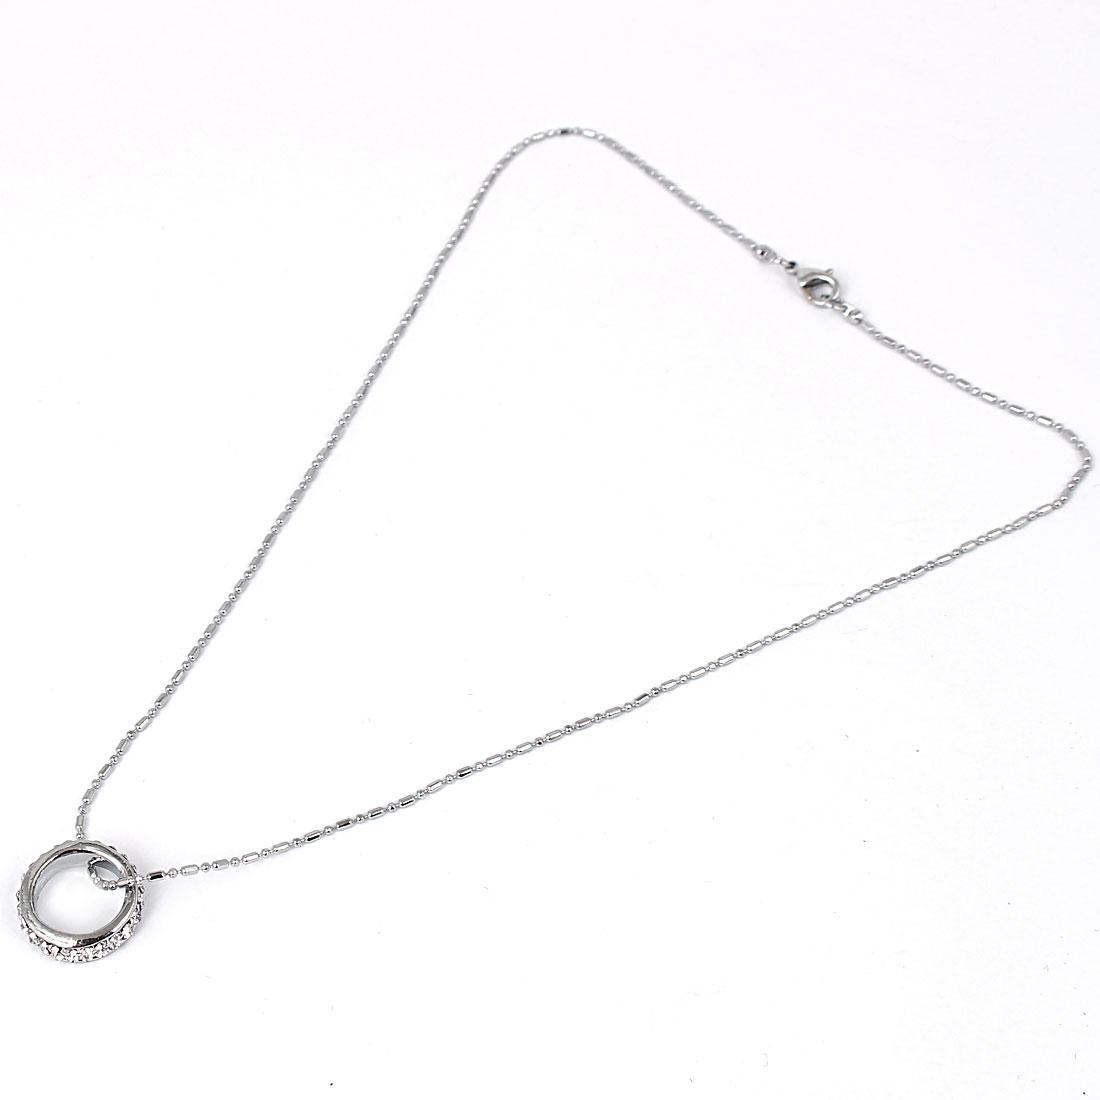 Women Rhinestone Bead Ring Pendant Chain Necklace Jewelry Silver Tone